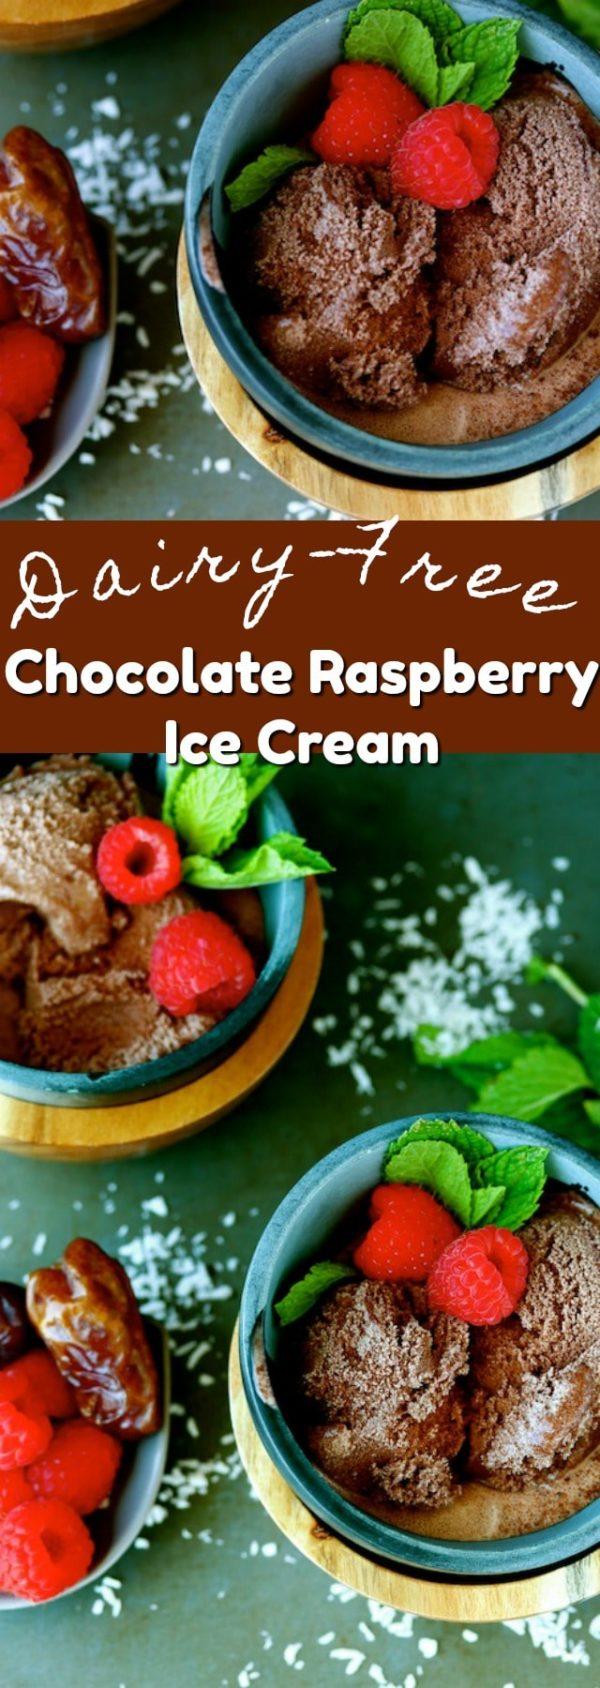 Dairy-free Chocolate Raspberry Ice Cream made using coconut milk. Date-sweetened so no refined sugars necessary!